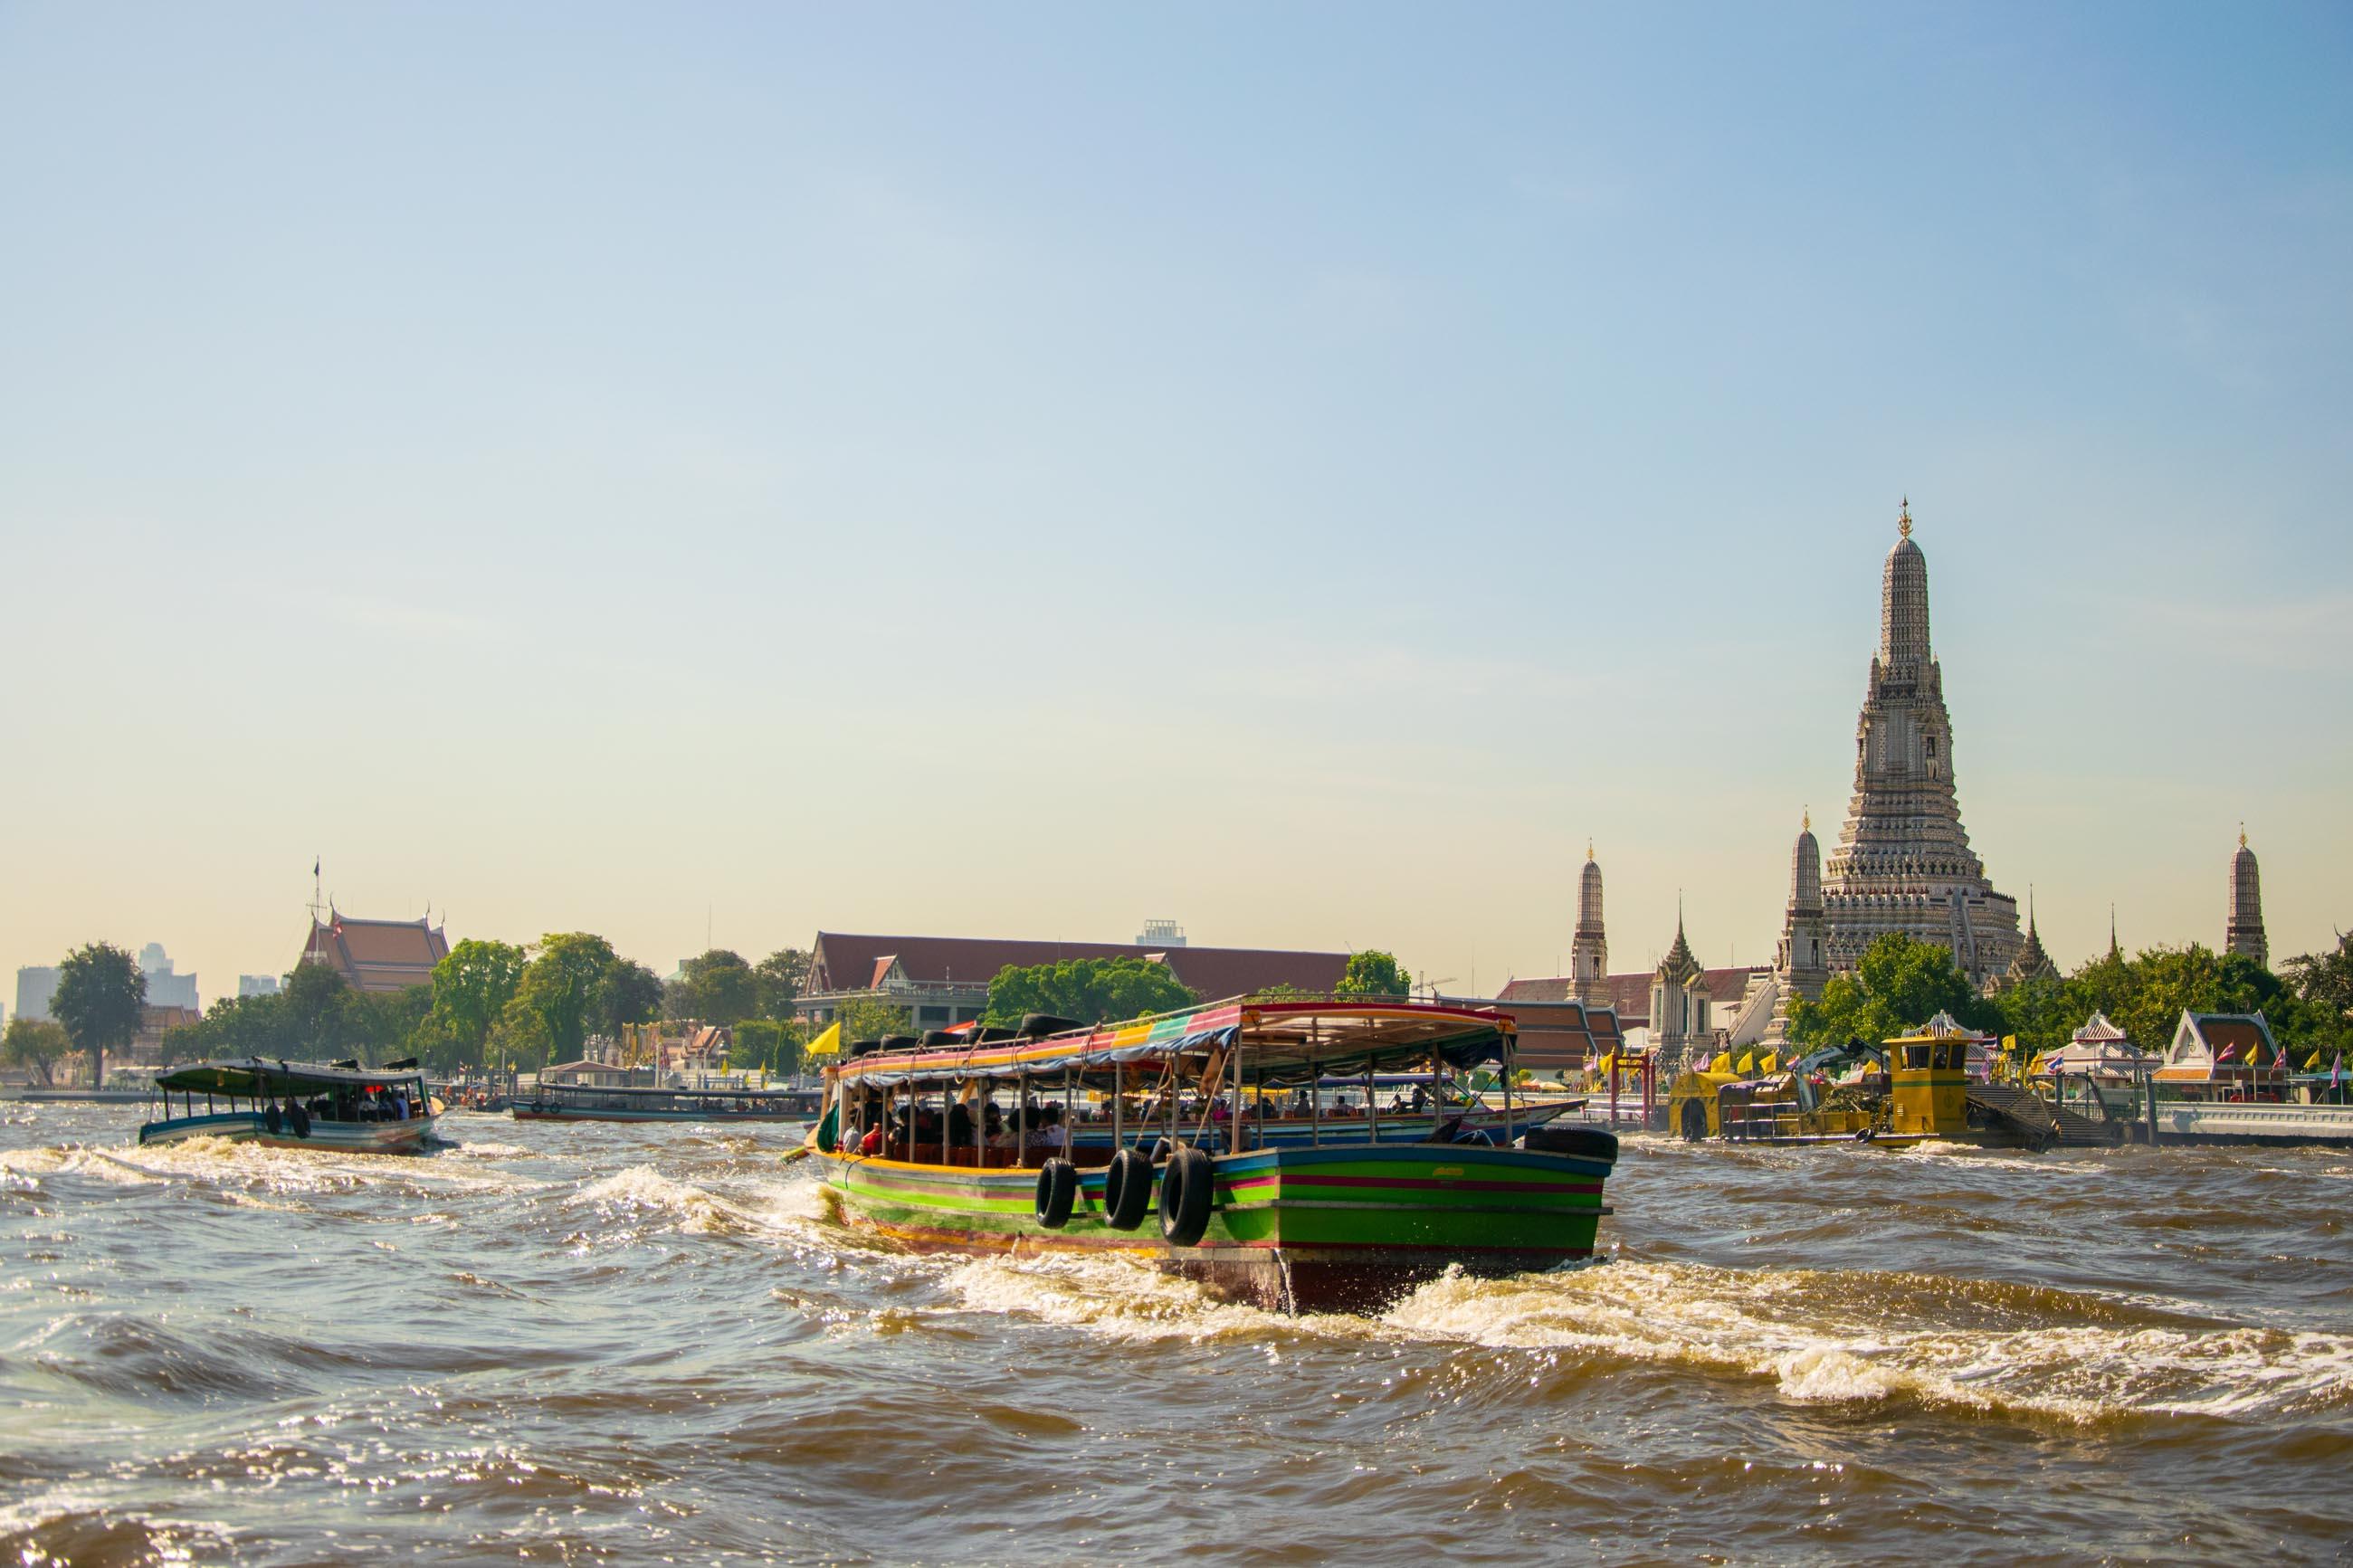 https://bubo.sk/uploads/galleries/5062/adam_zahorsky_thajsko_bangkok_dsc_0159.jpg